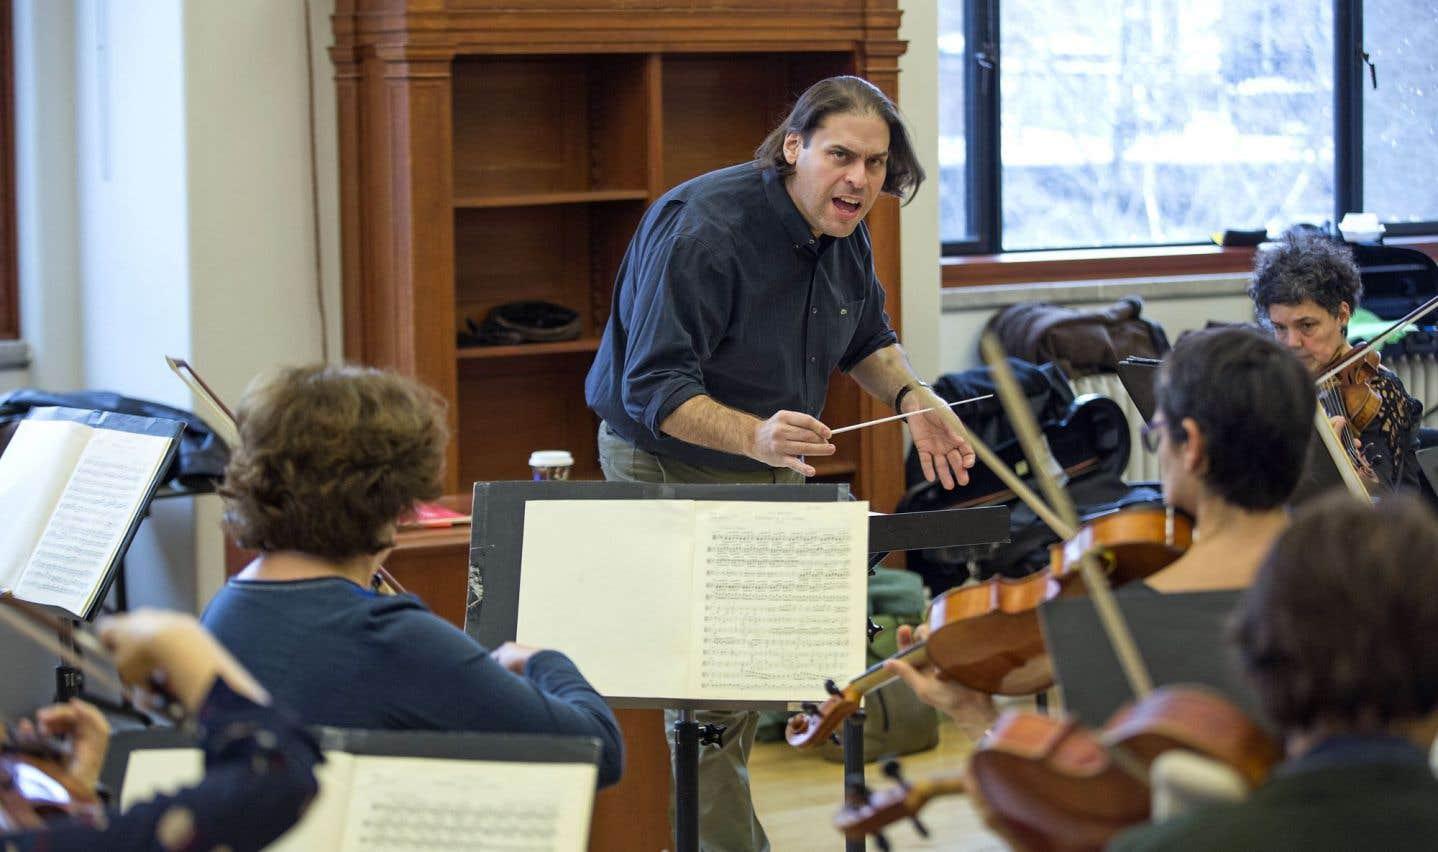 Le pianiste Christian Blackshaw ouvrira la saison d'I Musici